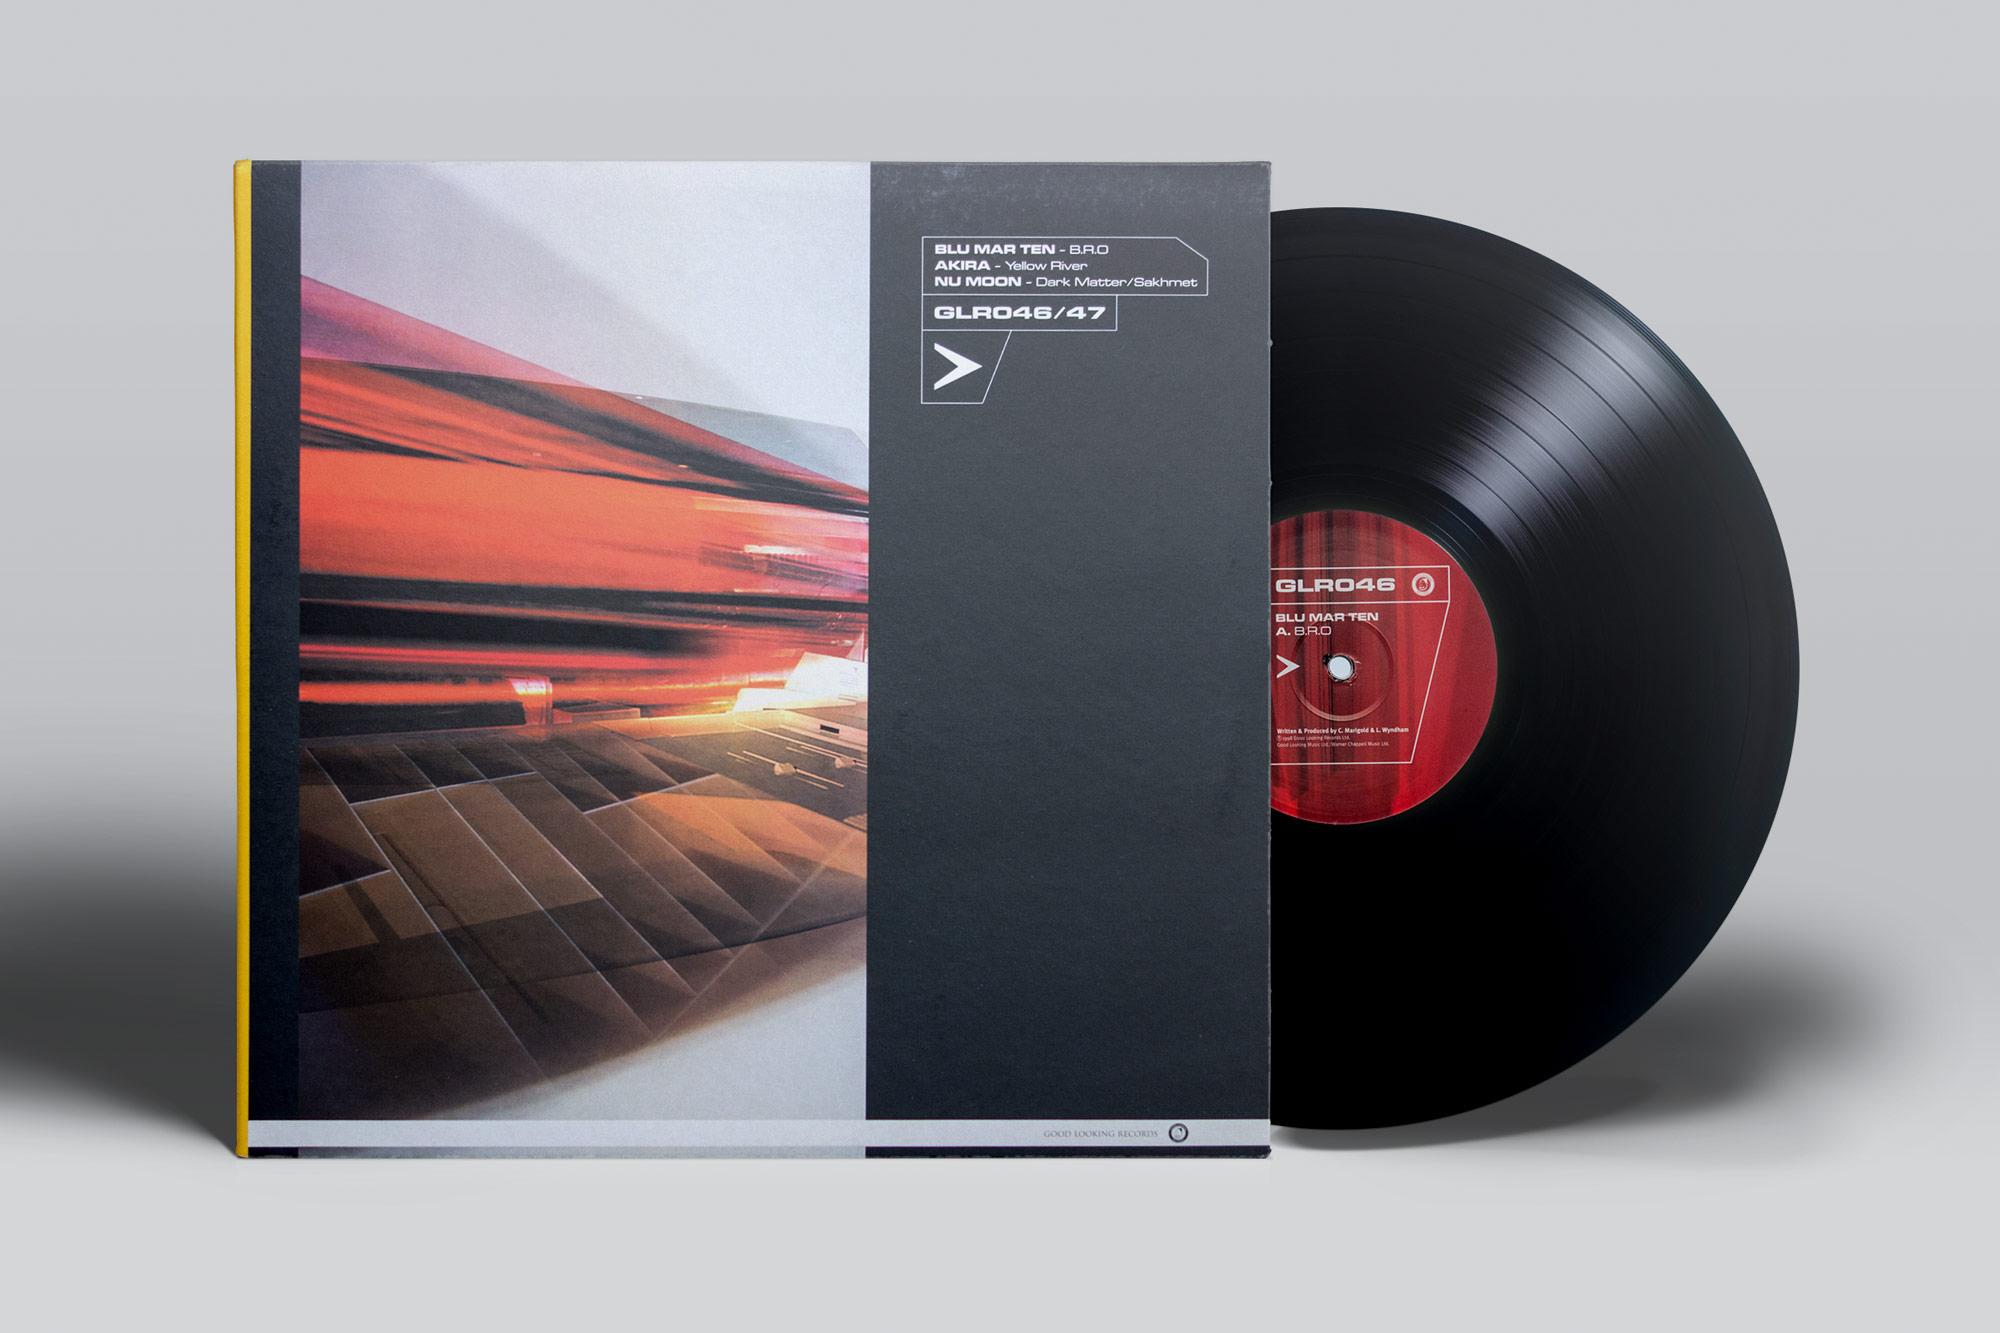 gareth-paul-jones-studio-design-good-looking-records-12-covers-cs-12-GLR046-GLR047